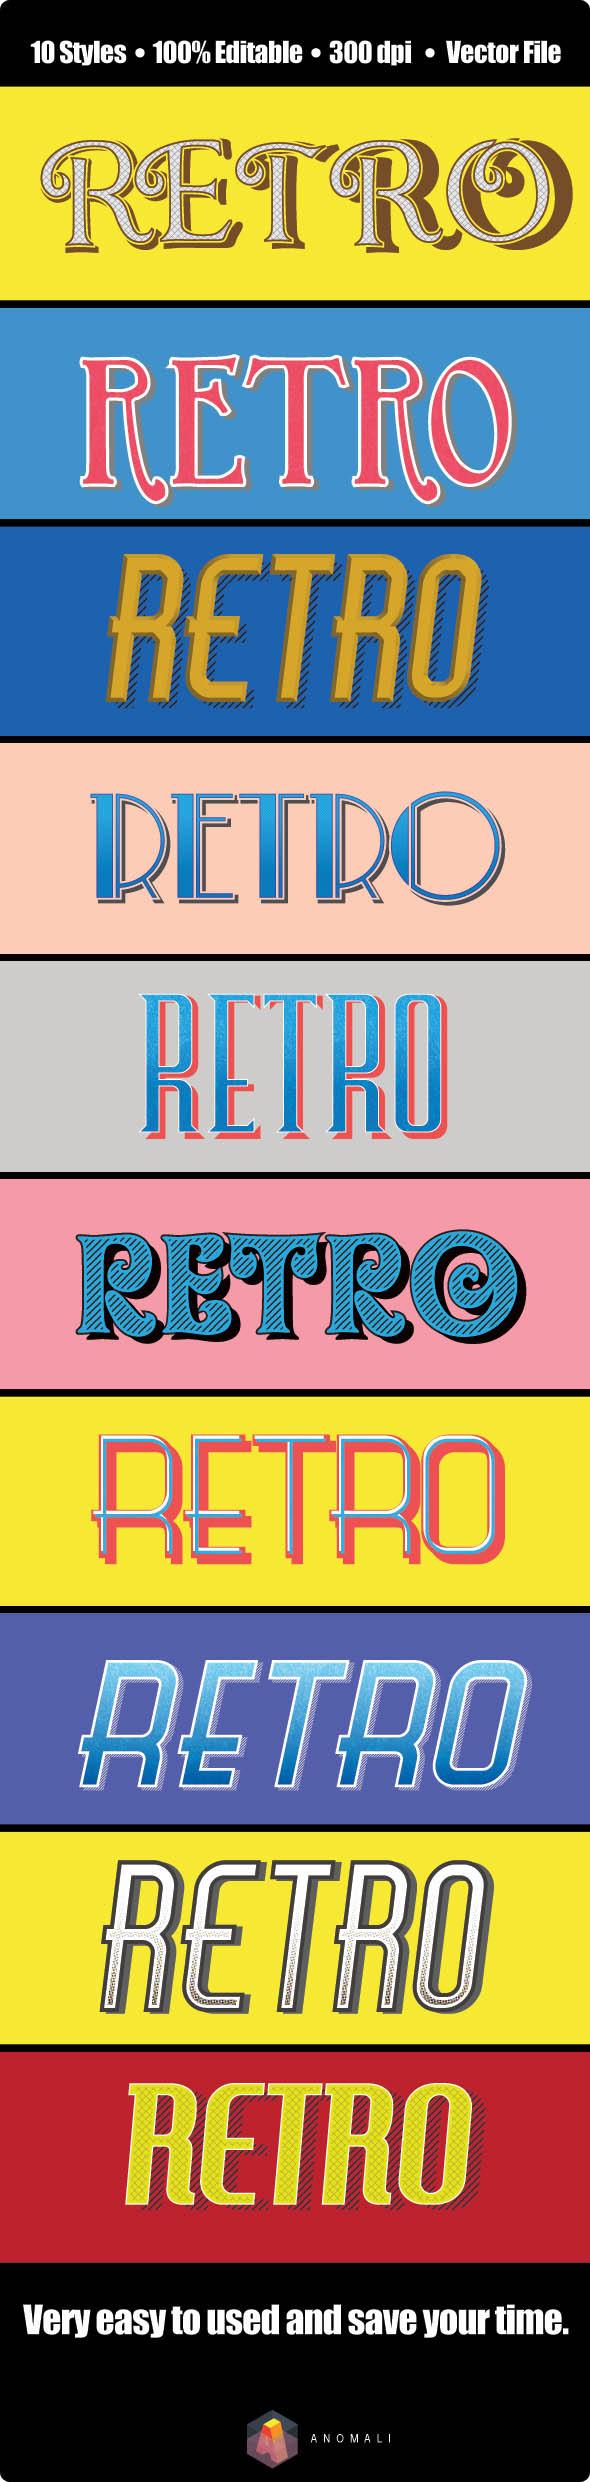 GraphicRiver Vintage Retro Text Effect for Illustrator 9512985